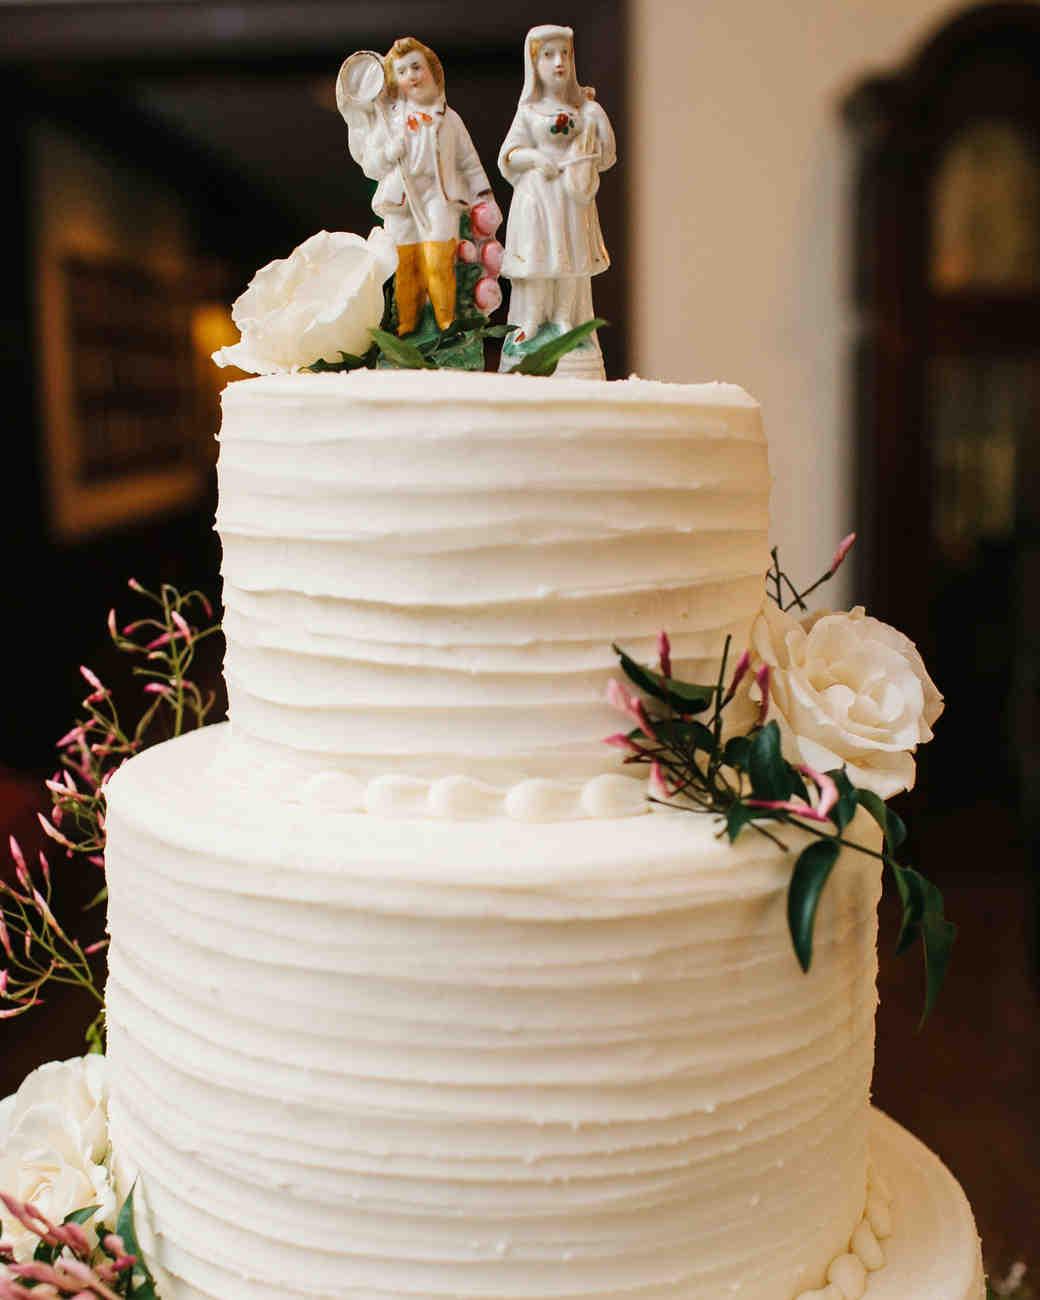 jane-ryan-wedding-cake1-170-s111352-0714.jpg